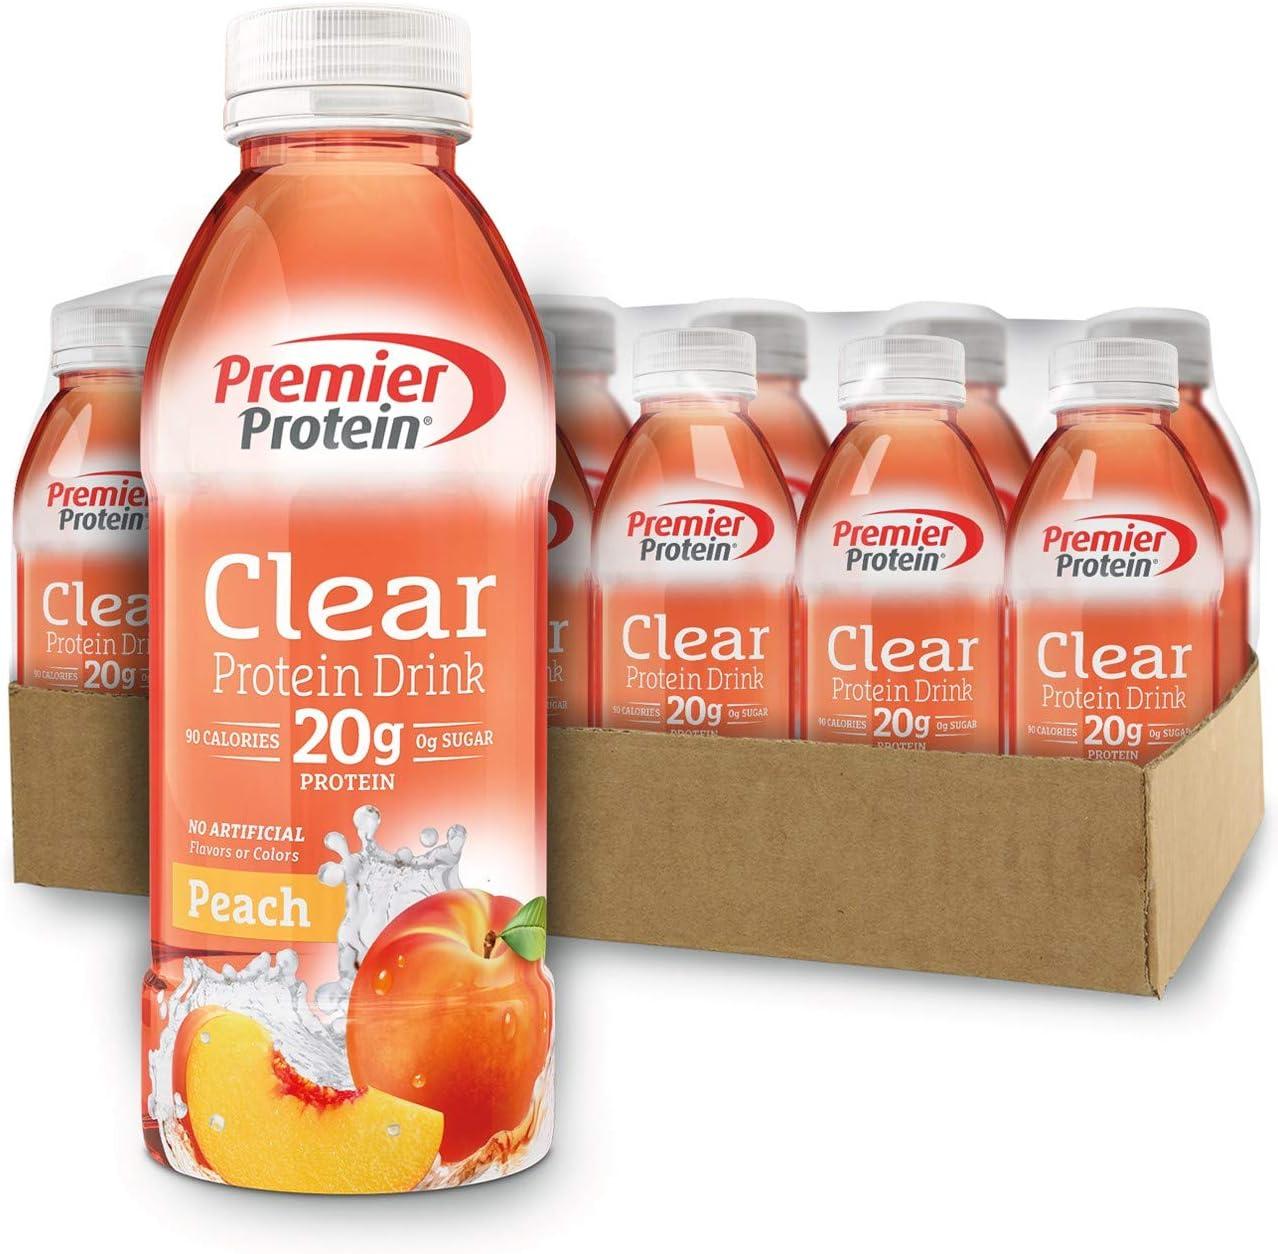 Premier Protein Premier Clear Protein Drink Peach (12/16.9 Fl Oz Net Wt 202.8 ), 202.8 Fl Oz